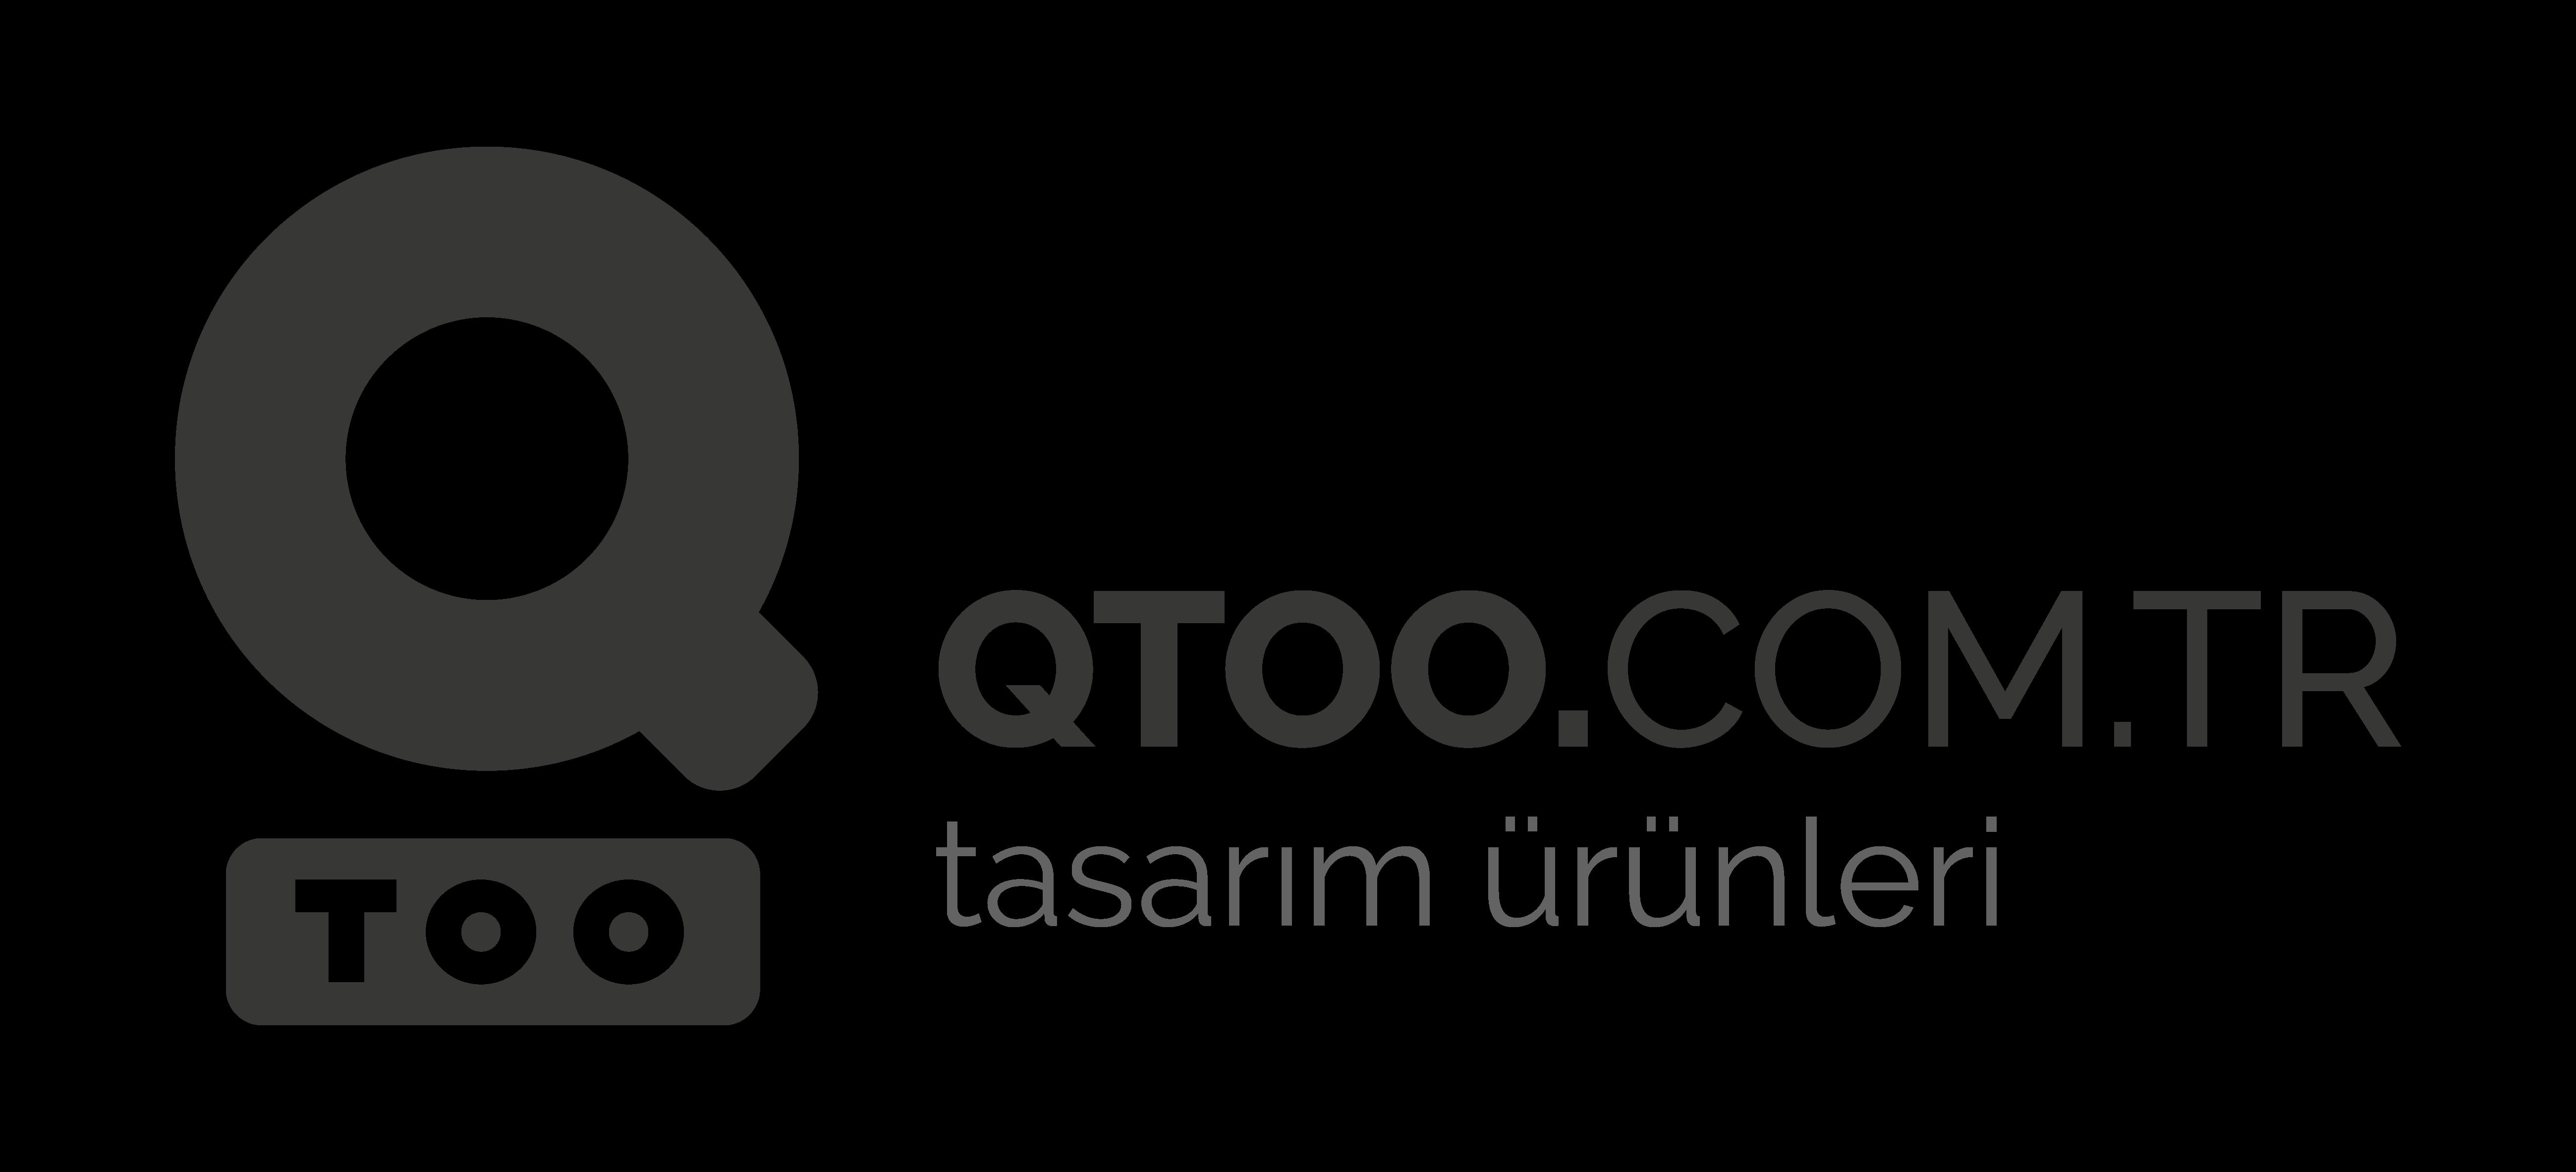 qtoologo2020-02.png (106 KB)